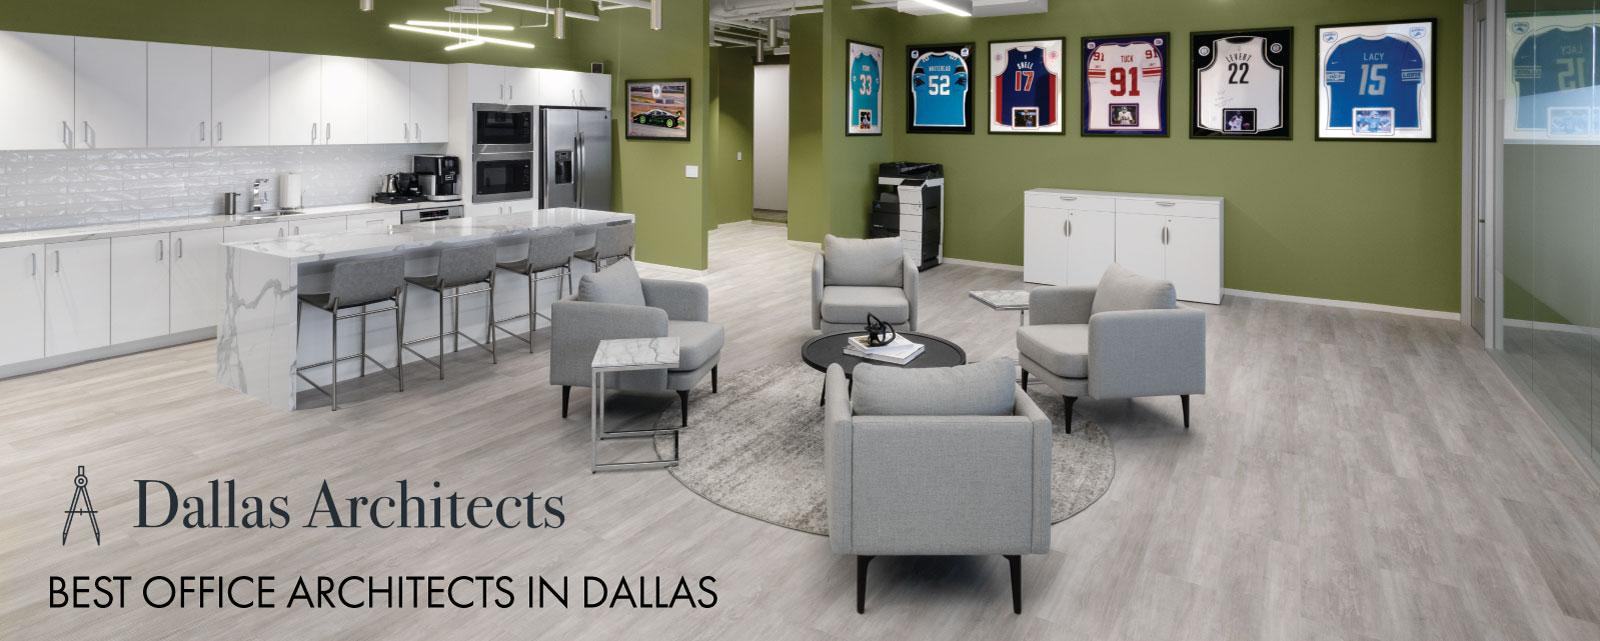 Best Office Architects Dallas – Dallas Architect